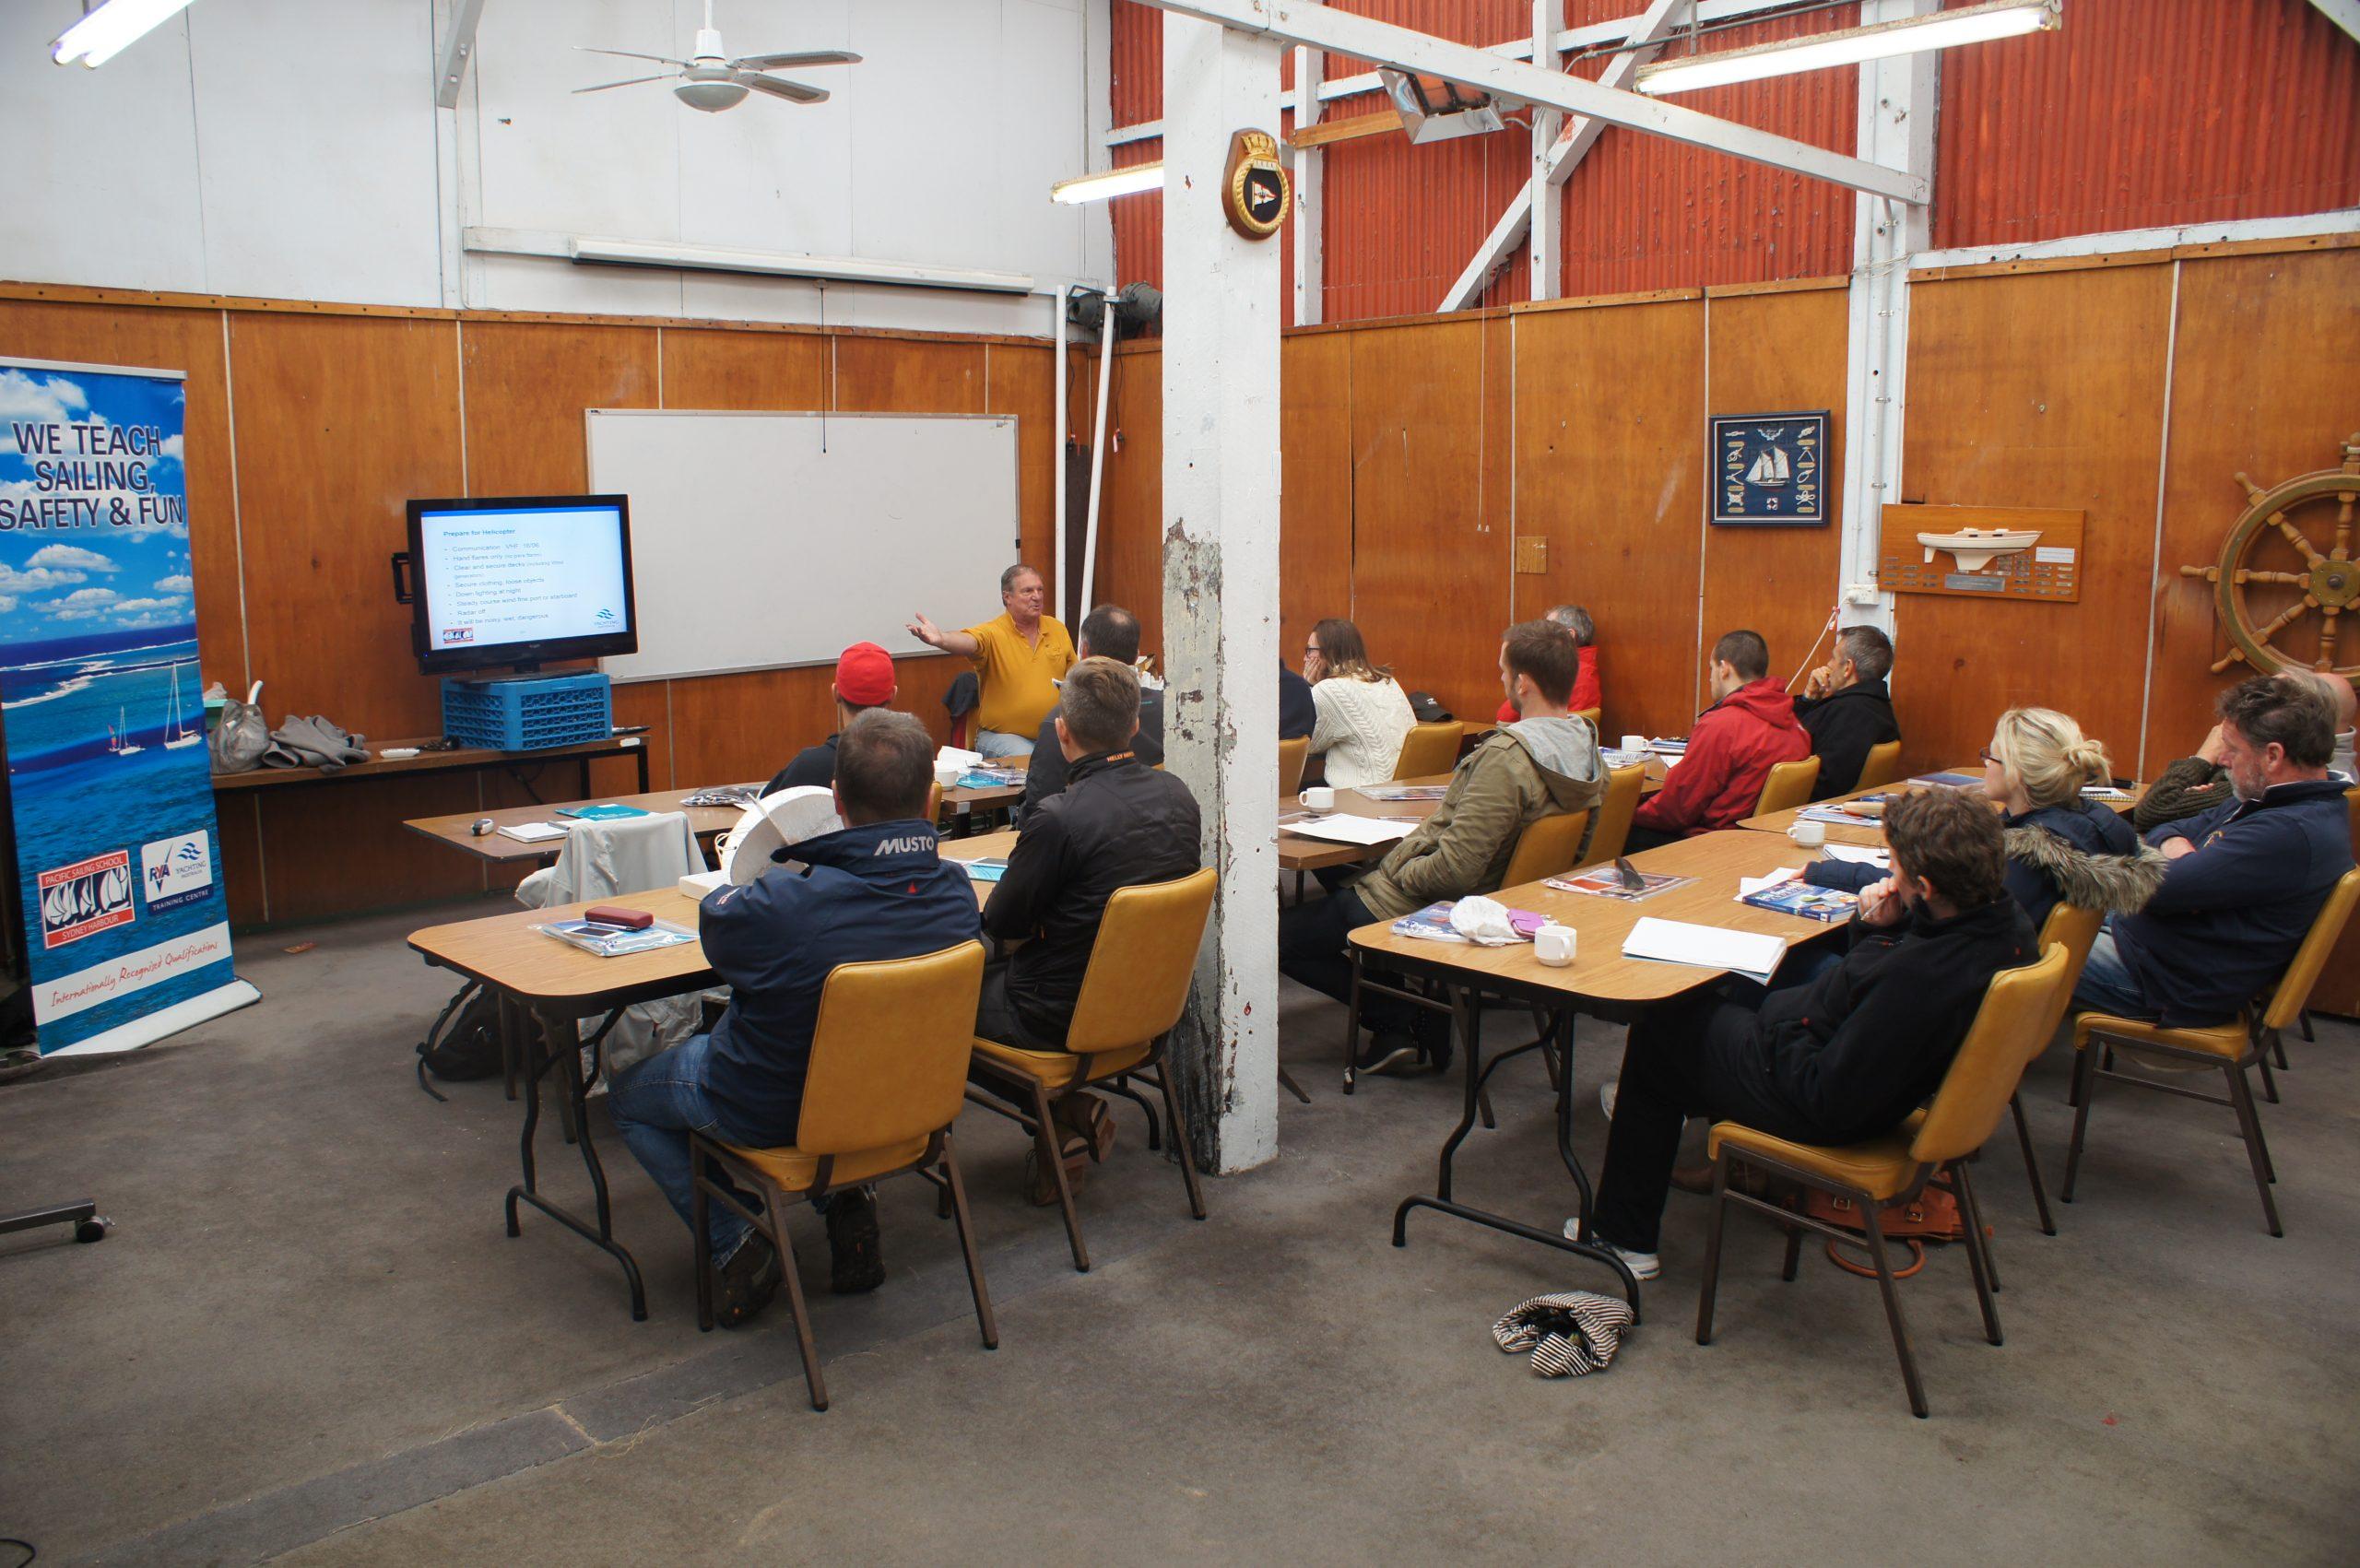 Classroom at RANSA for Pacific Sailing School.